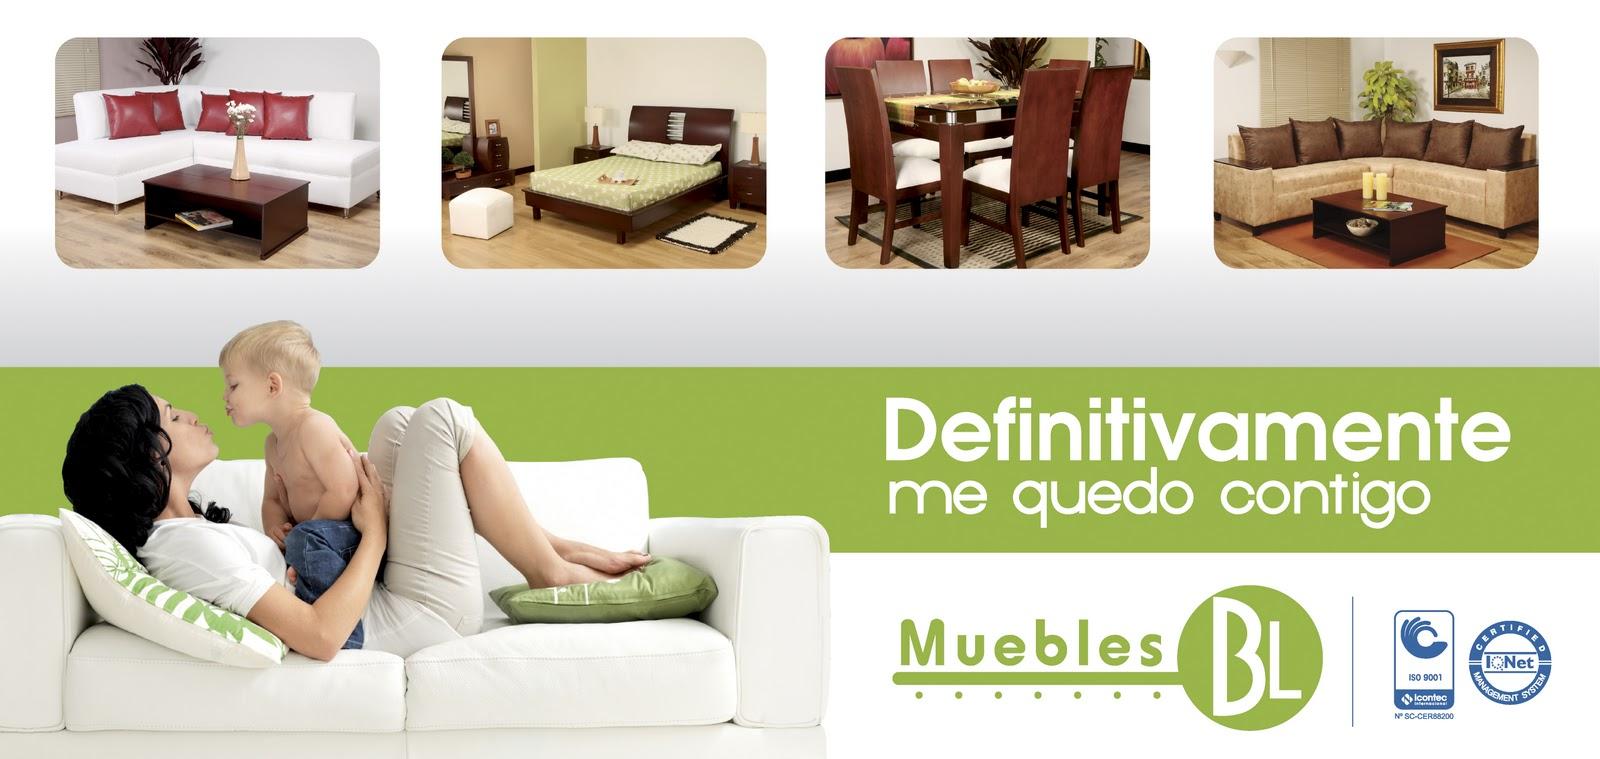 Empresa Muebles Bl # Muebles Dosquebradas